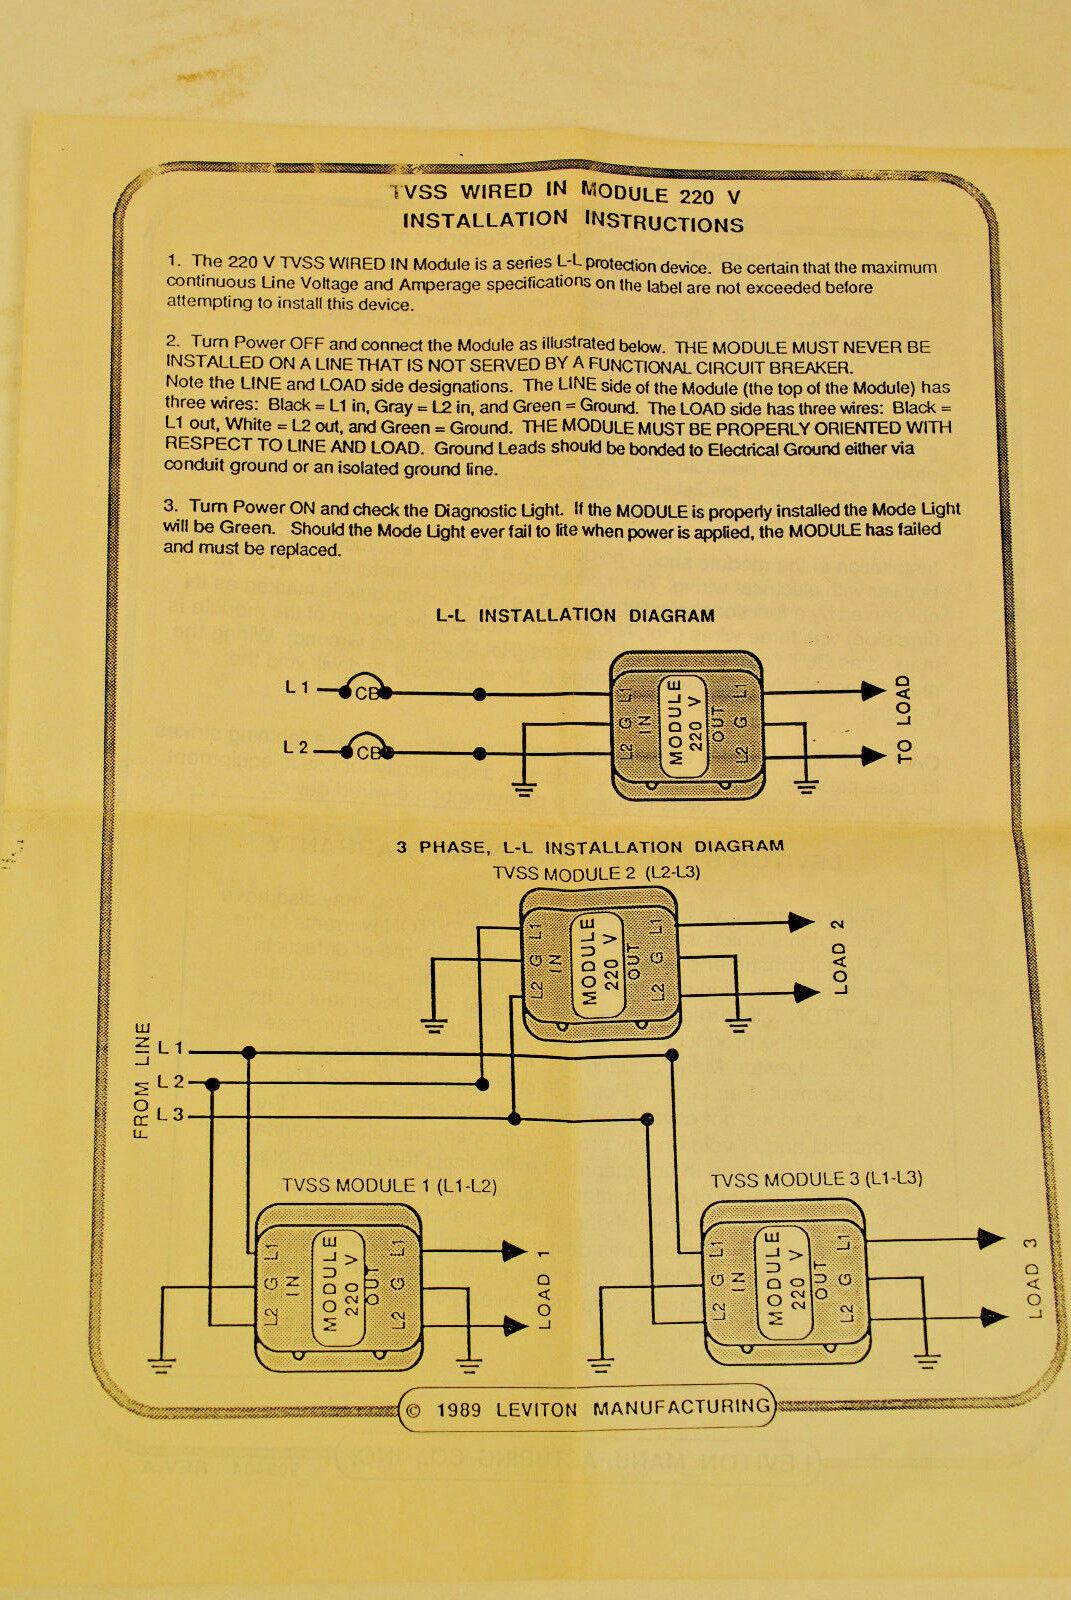 tvss breaker wiring diagram wiring library Power Wiring Diagram leviton 51220 wm 220v 1 ph 20a transient voltage surge suppressor \u0026 noise filter